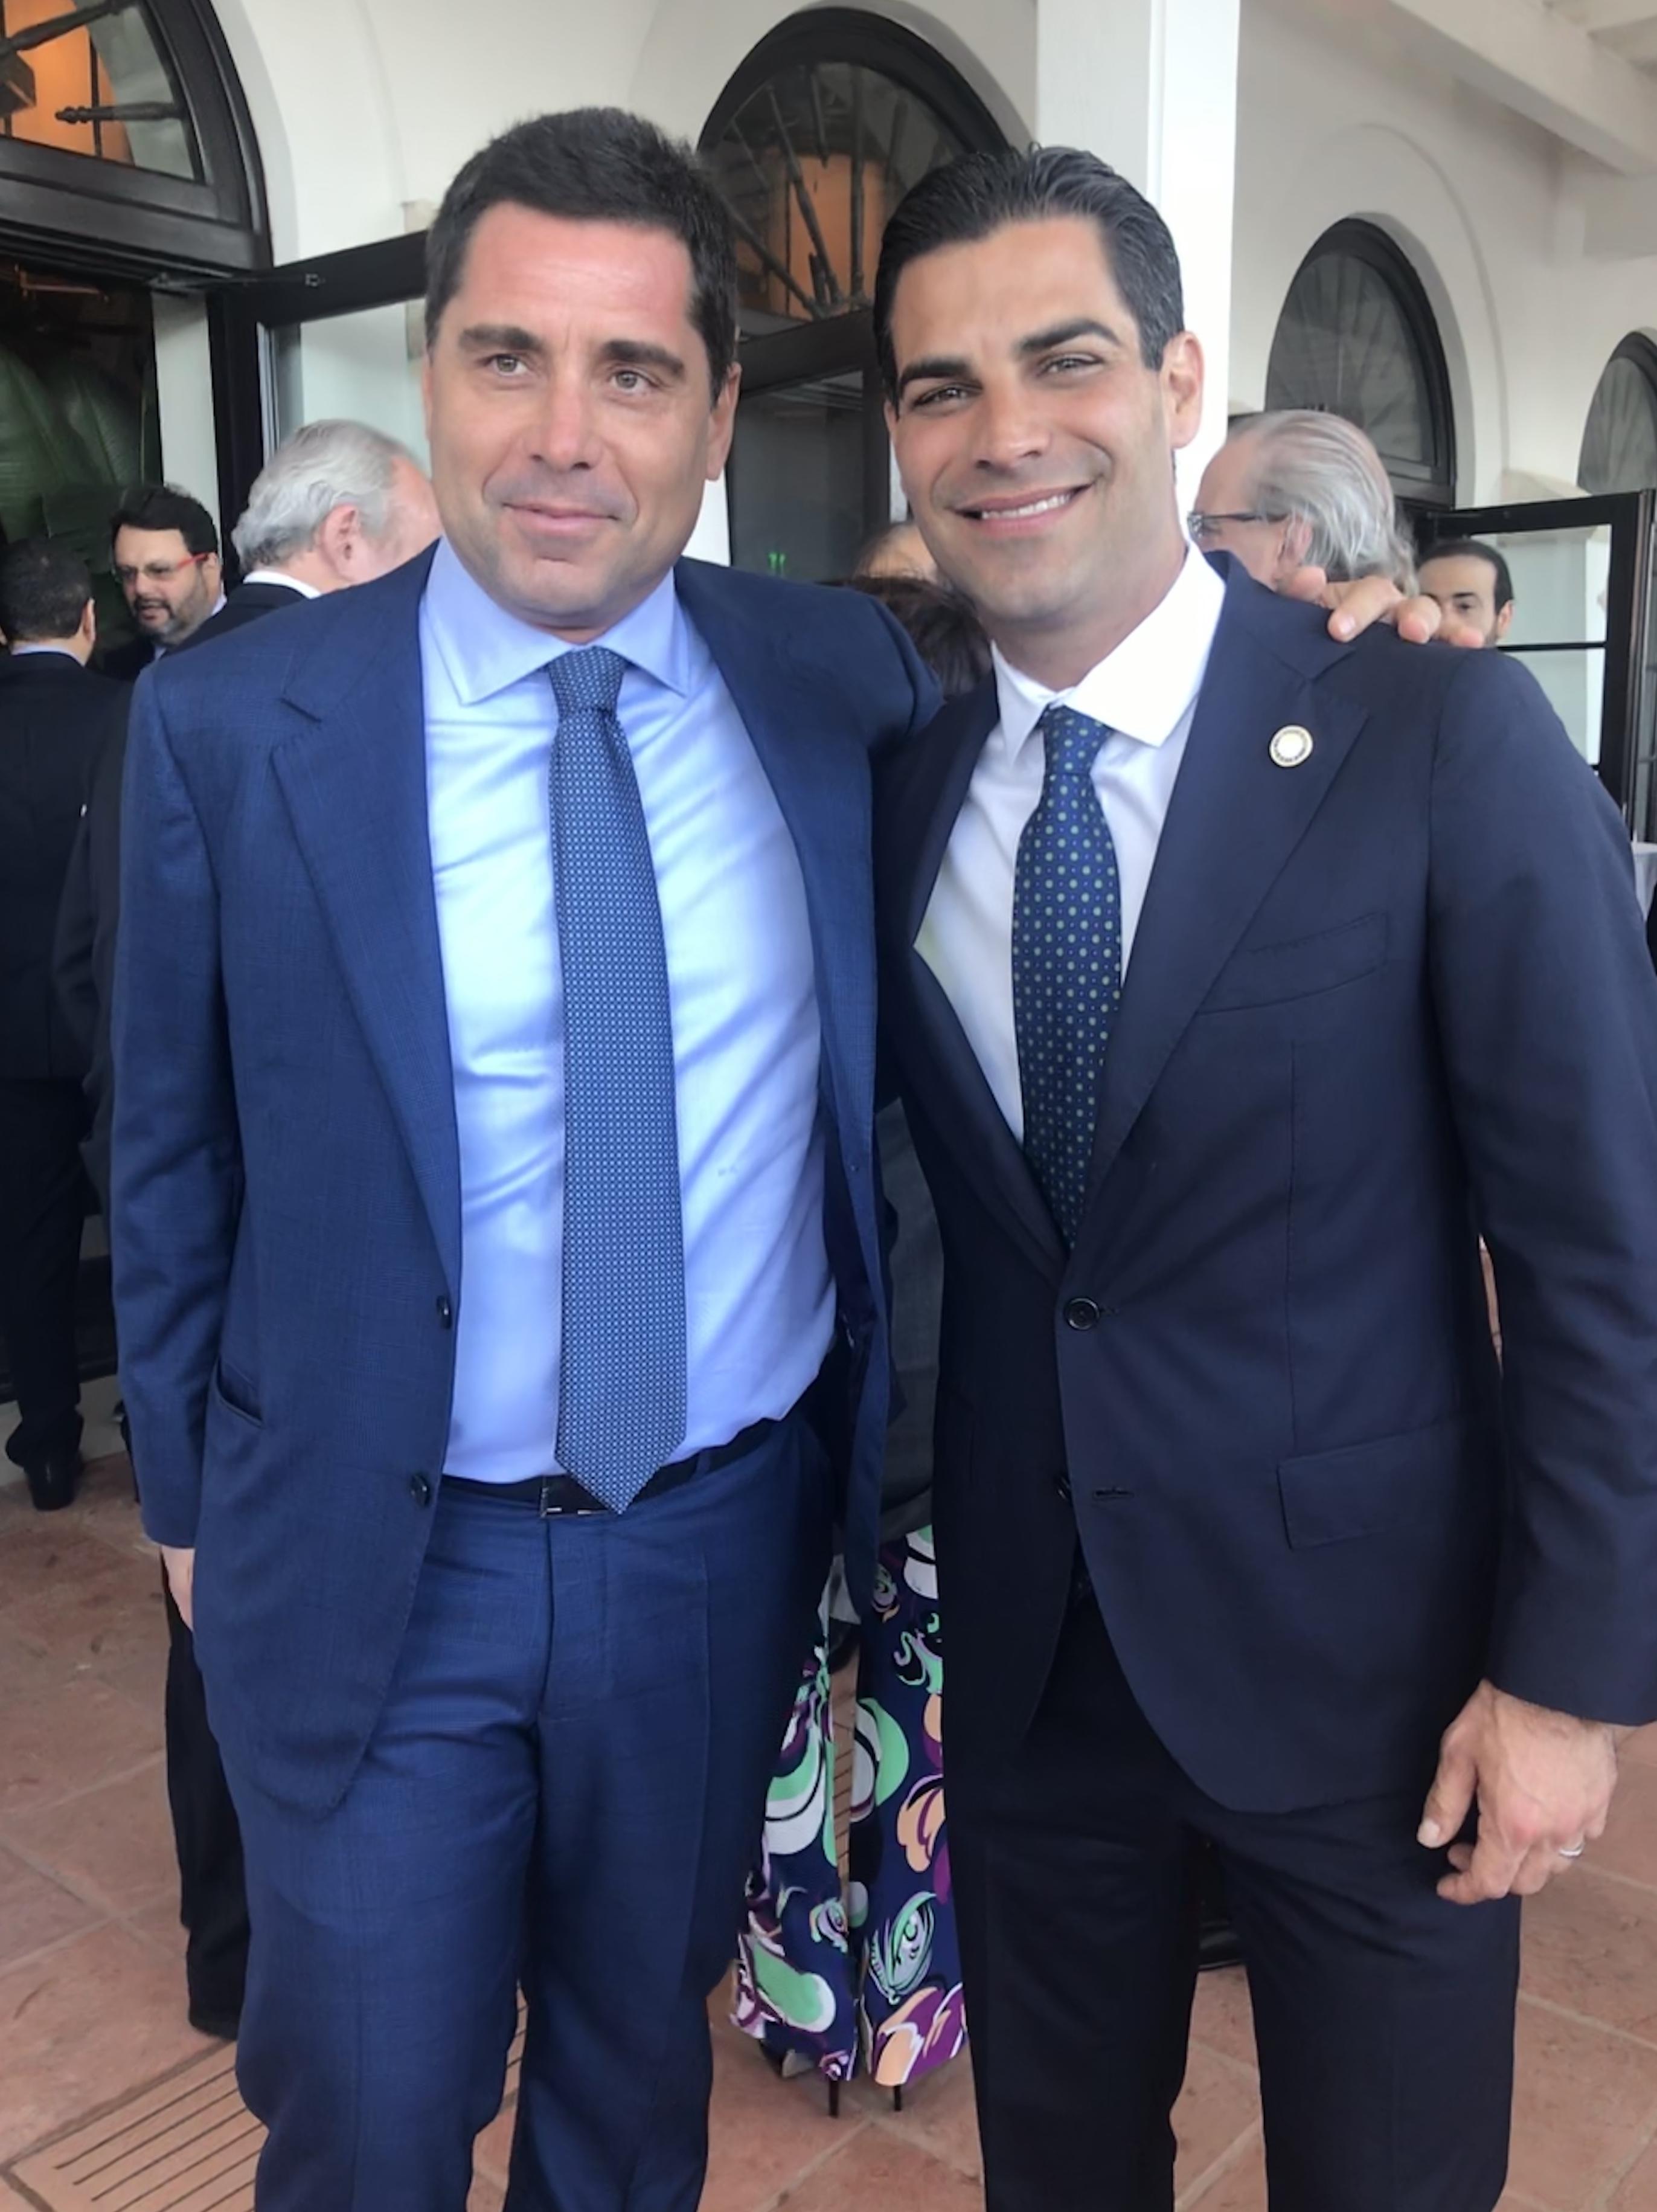 Riccardo Silva and Francis X Suarez, the Mayor of Miami